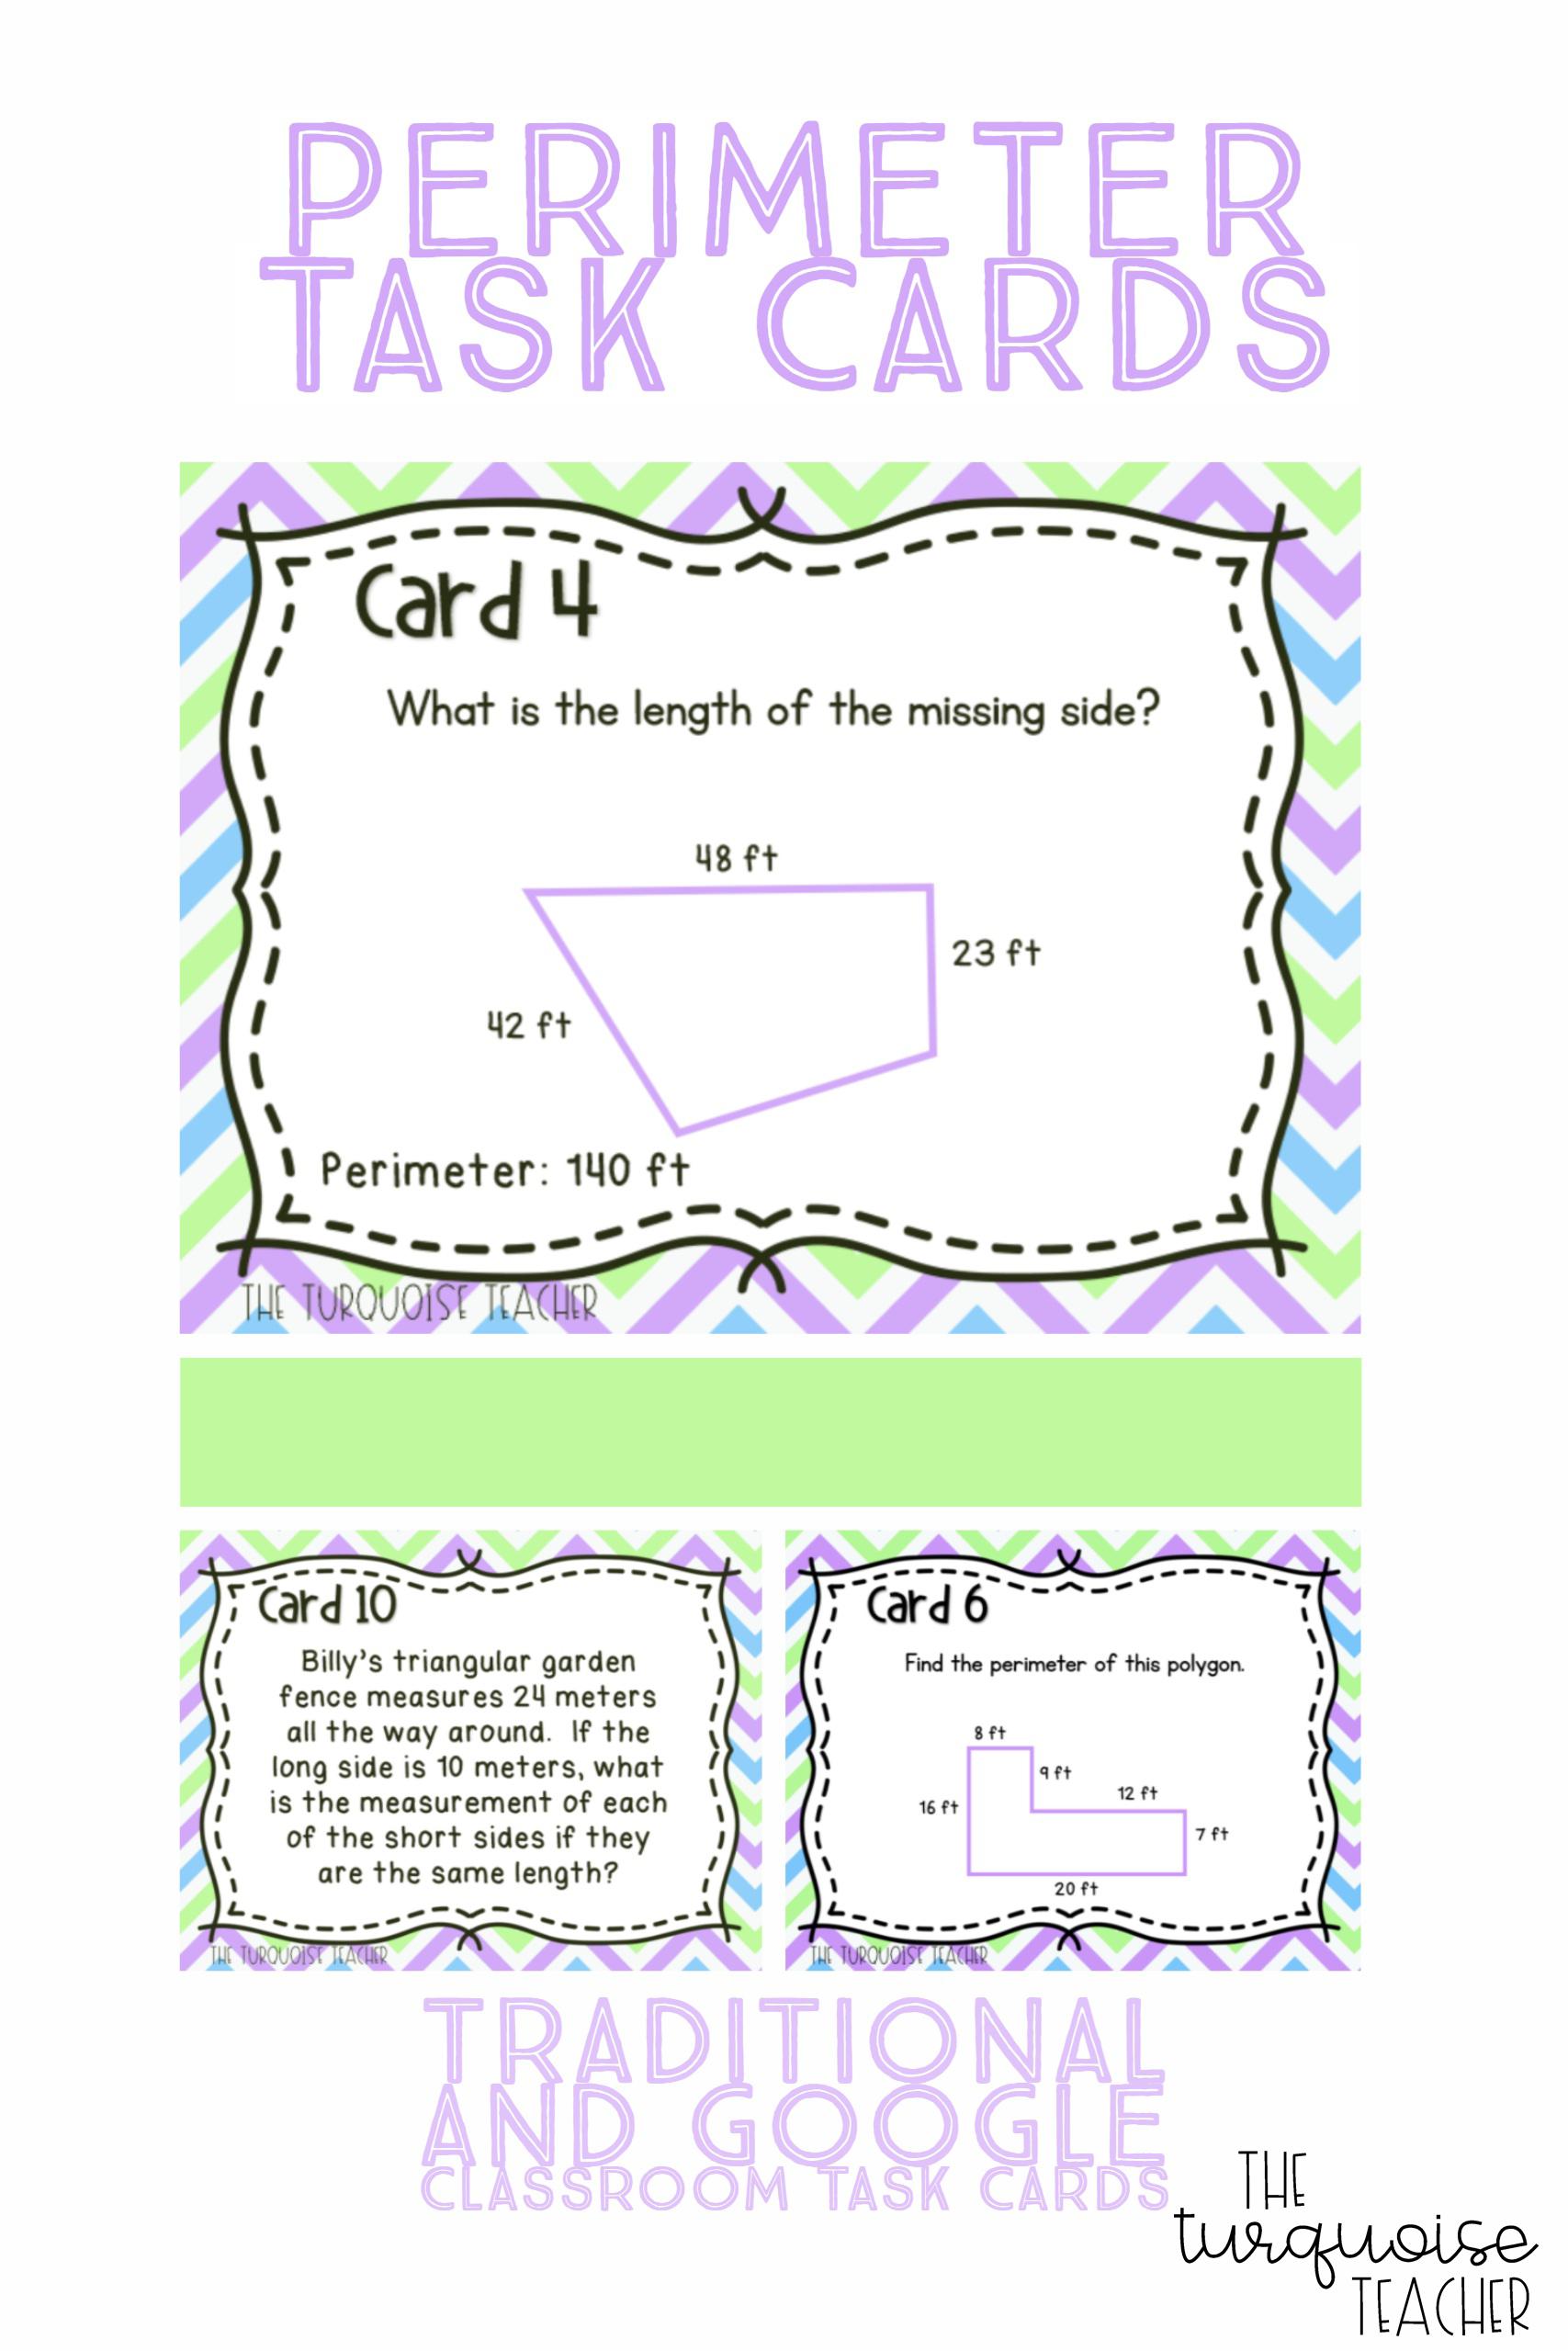 Third Grade Perimeter Task Cards And Classroom